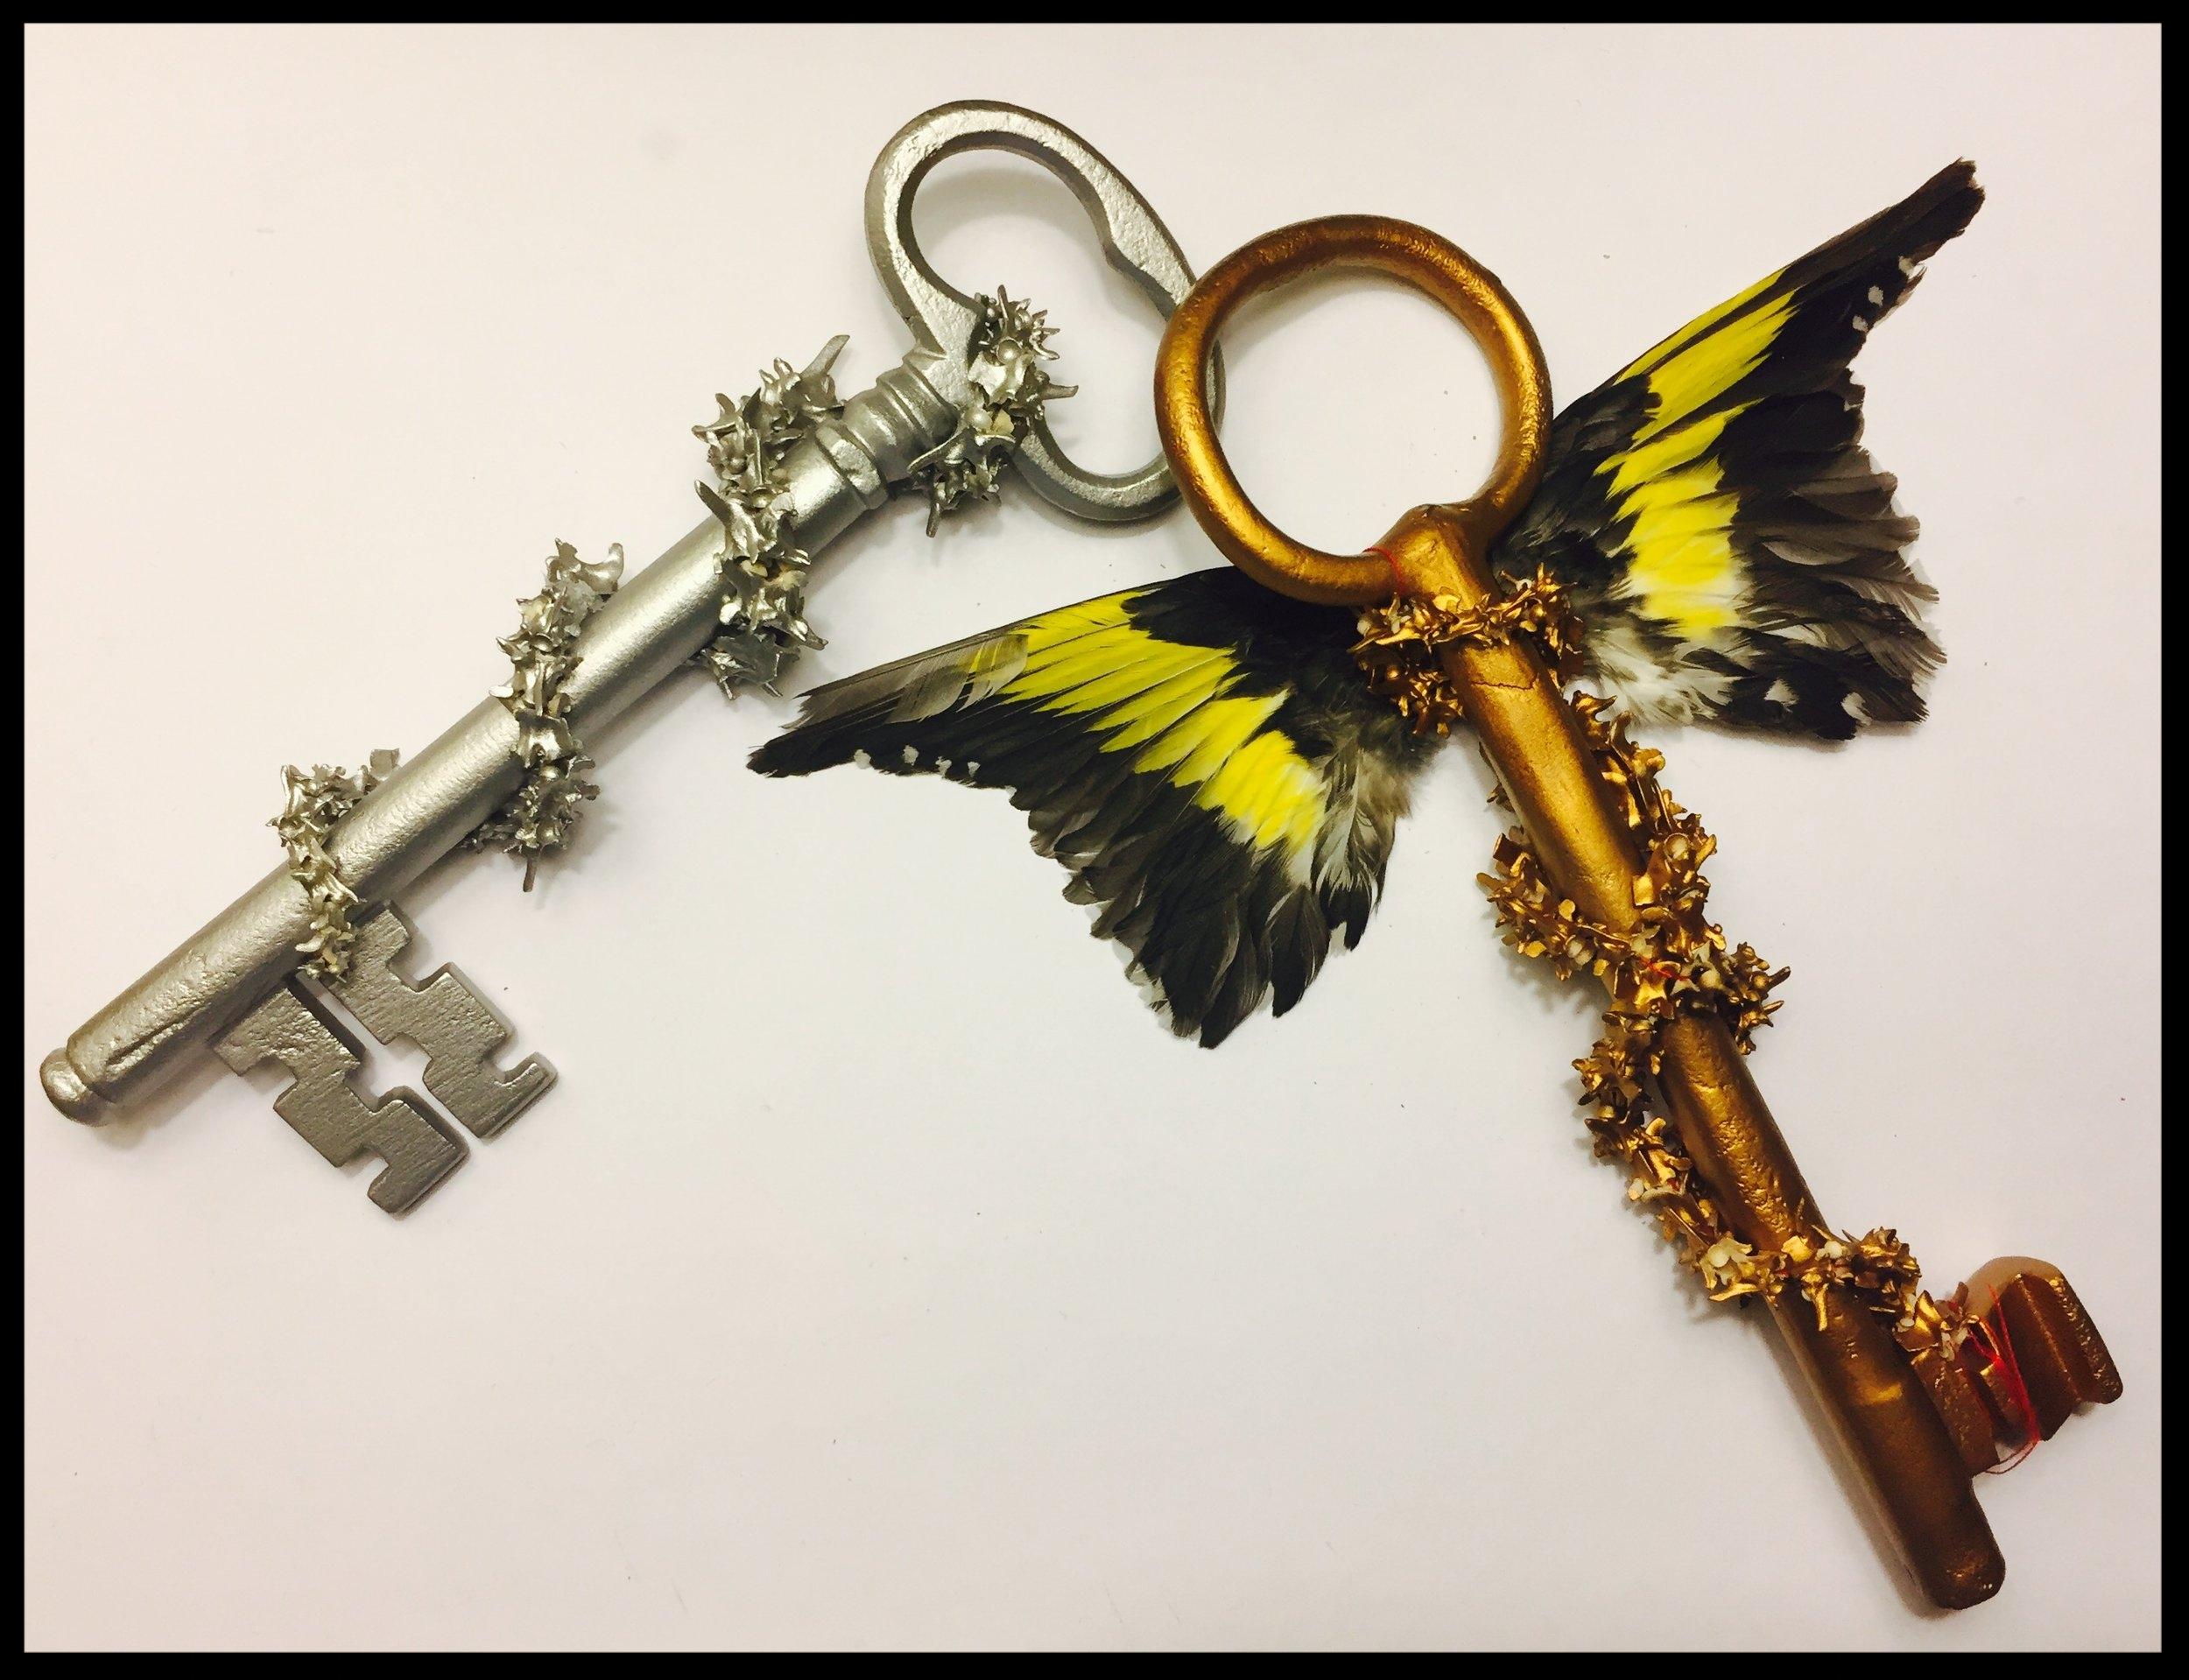 Keys tied with mother's red hair, Goldfinch wings, rattlesnake vertebrae